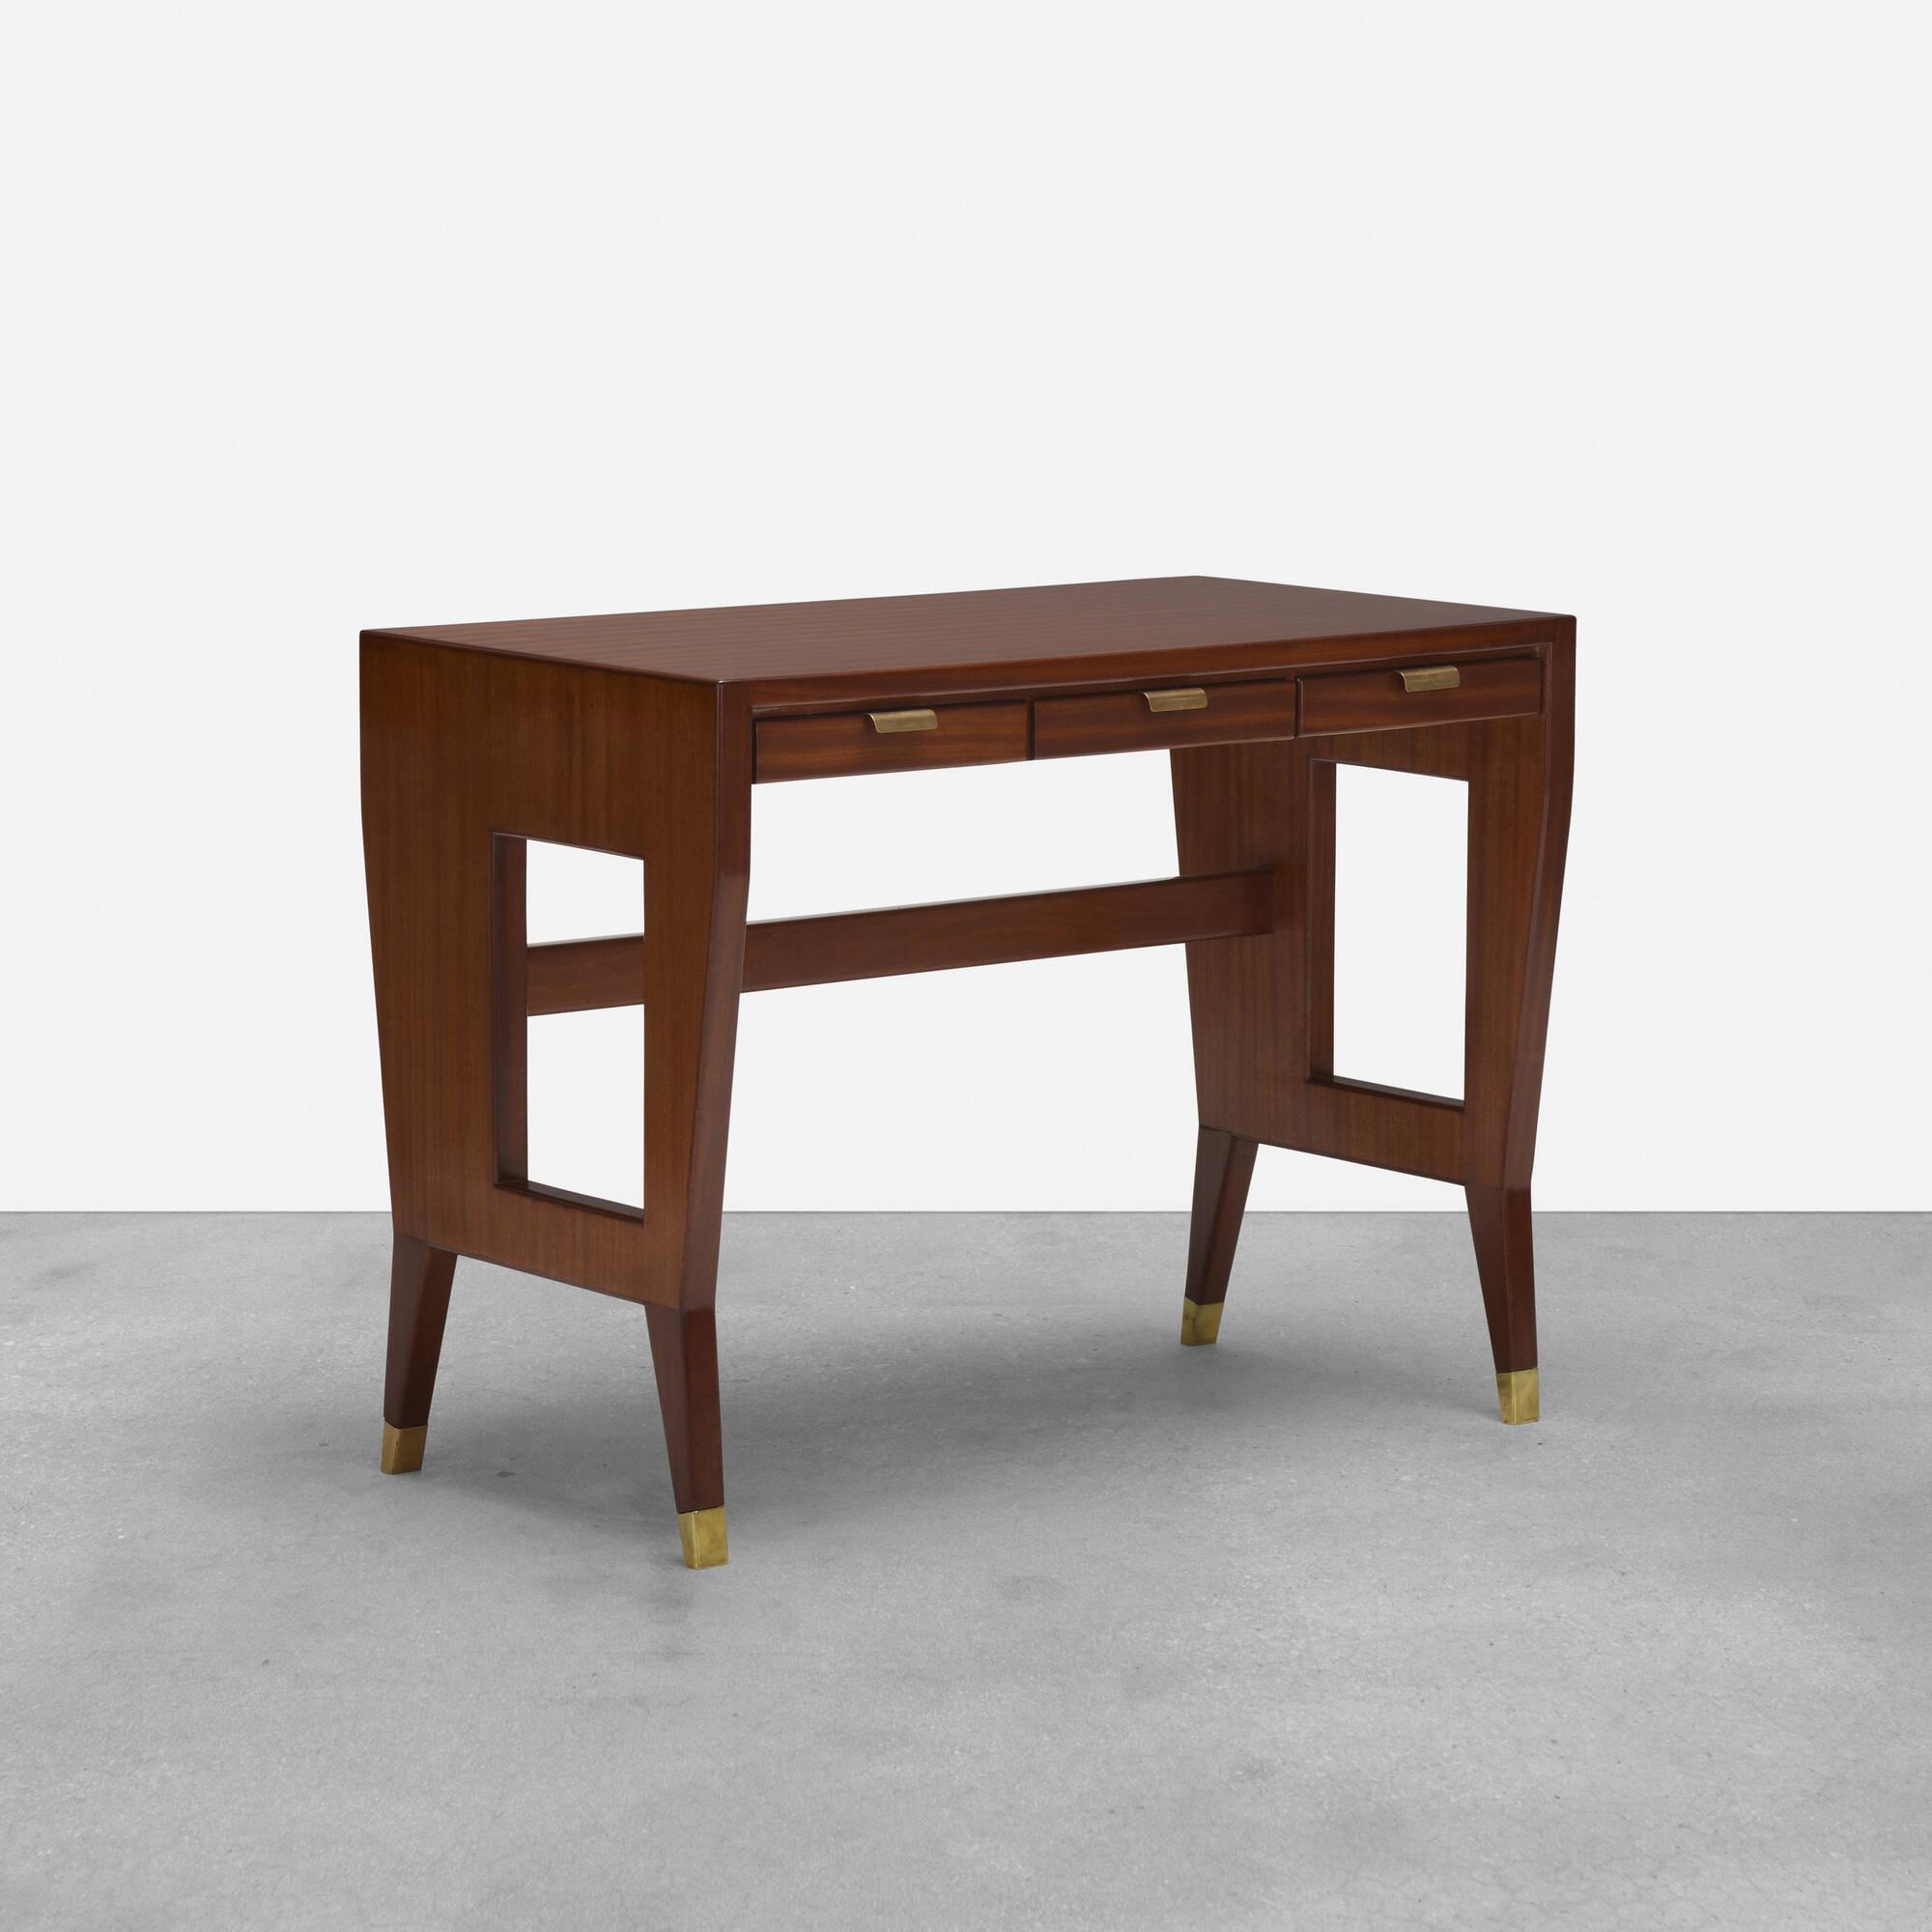 186: Gio Ponti / desk (1 of 3)